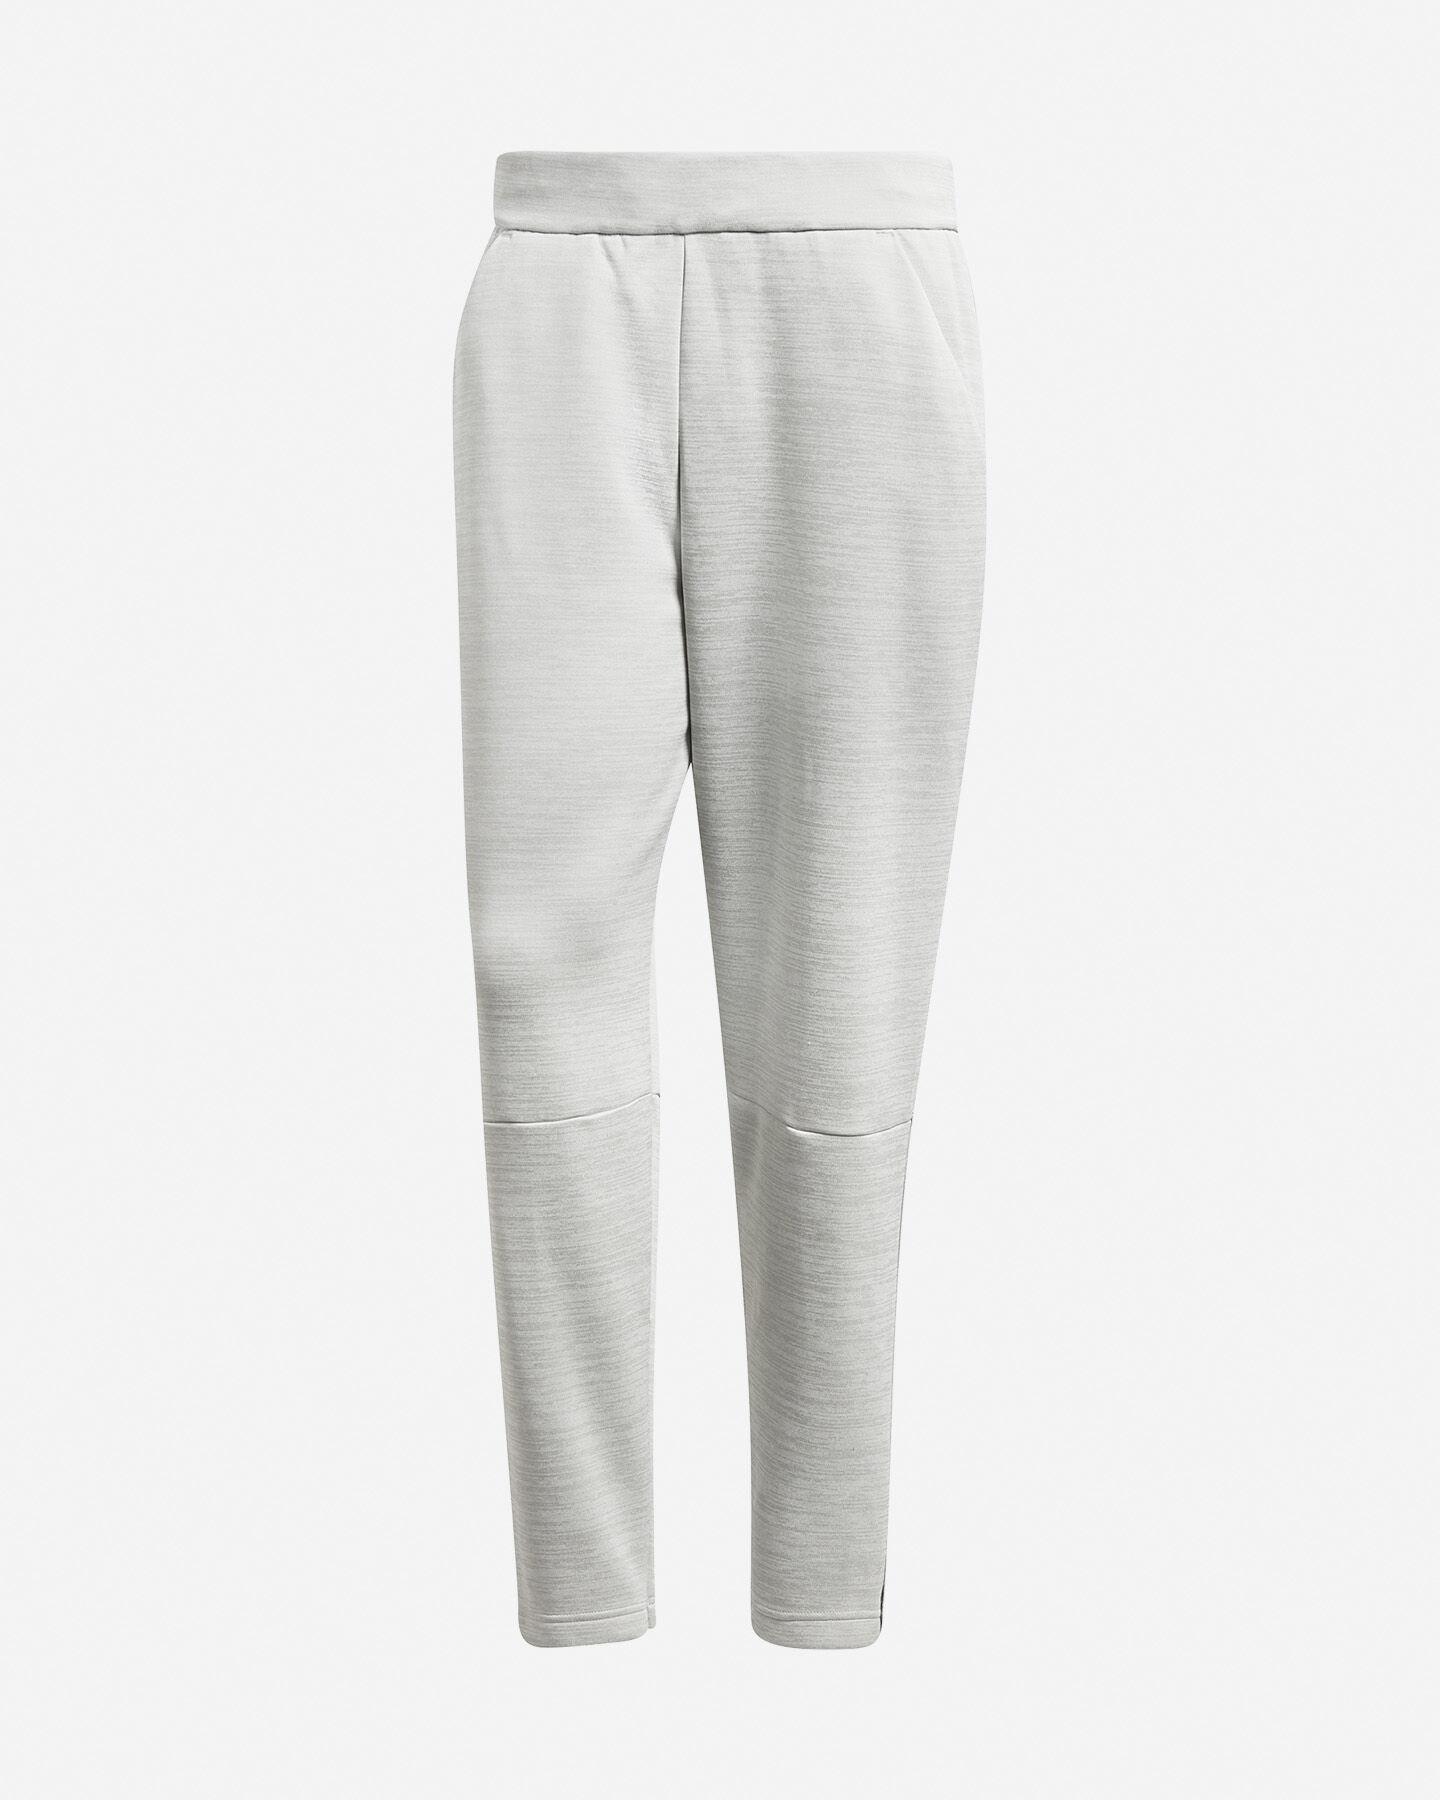 pantaloni adidas z.n.e. tapered